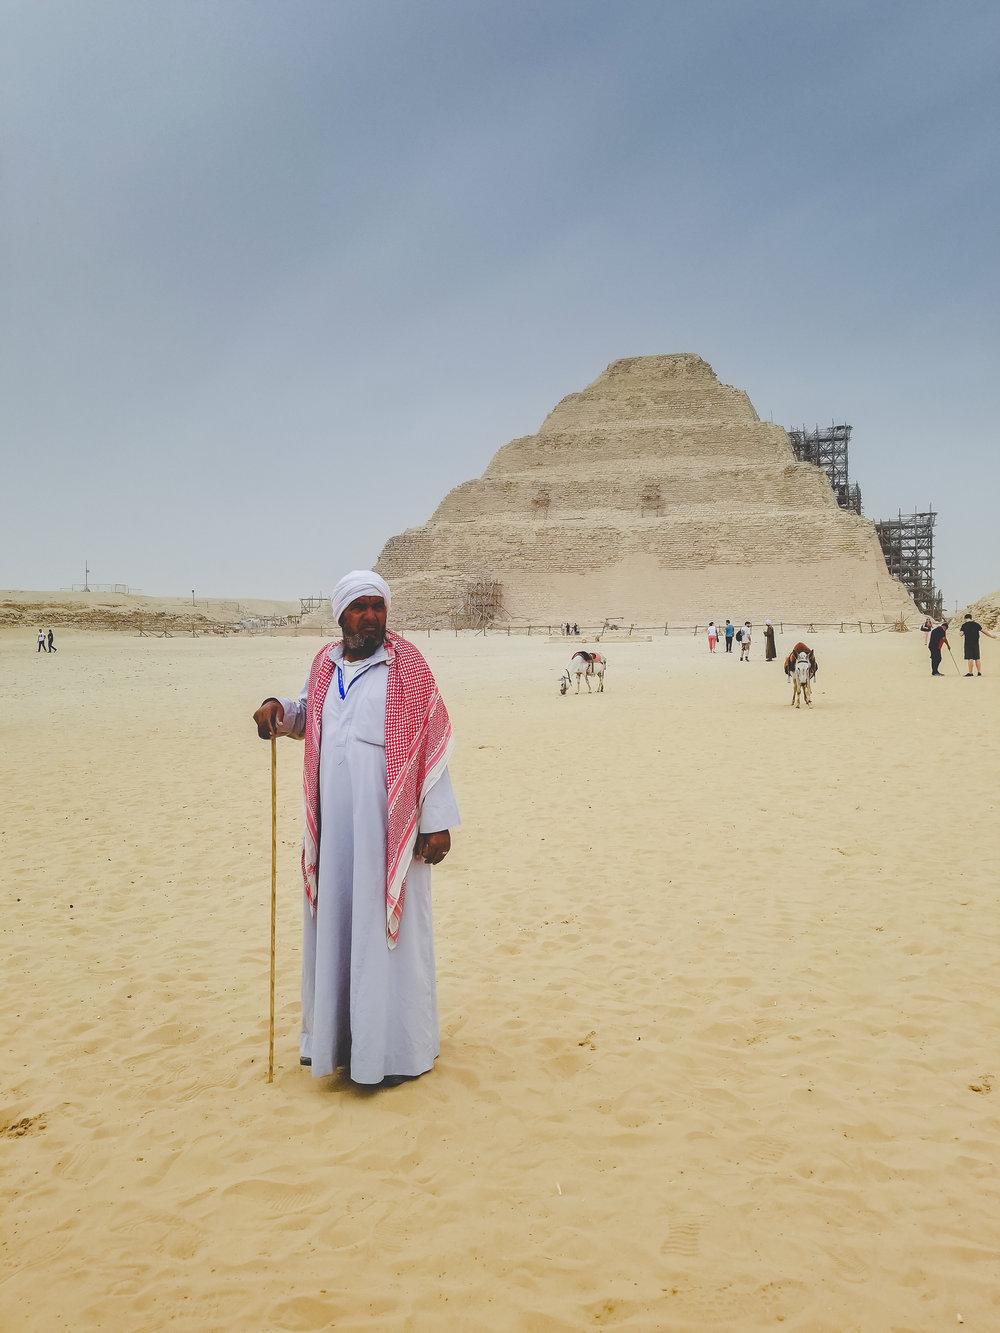 thetravelhub_egypt4.jpg